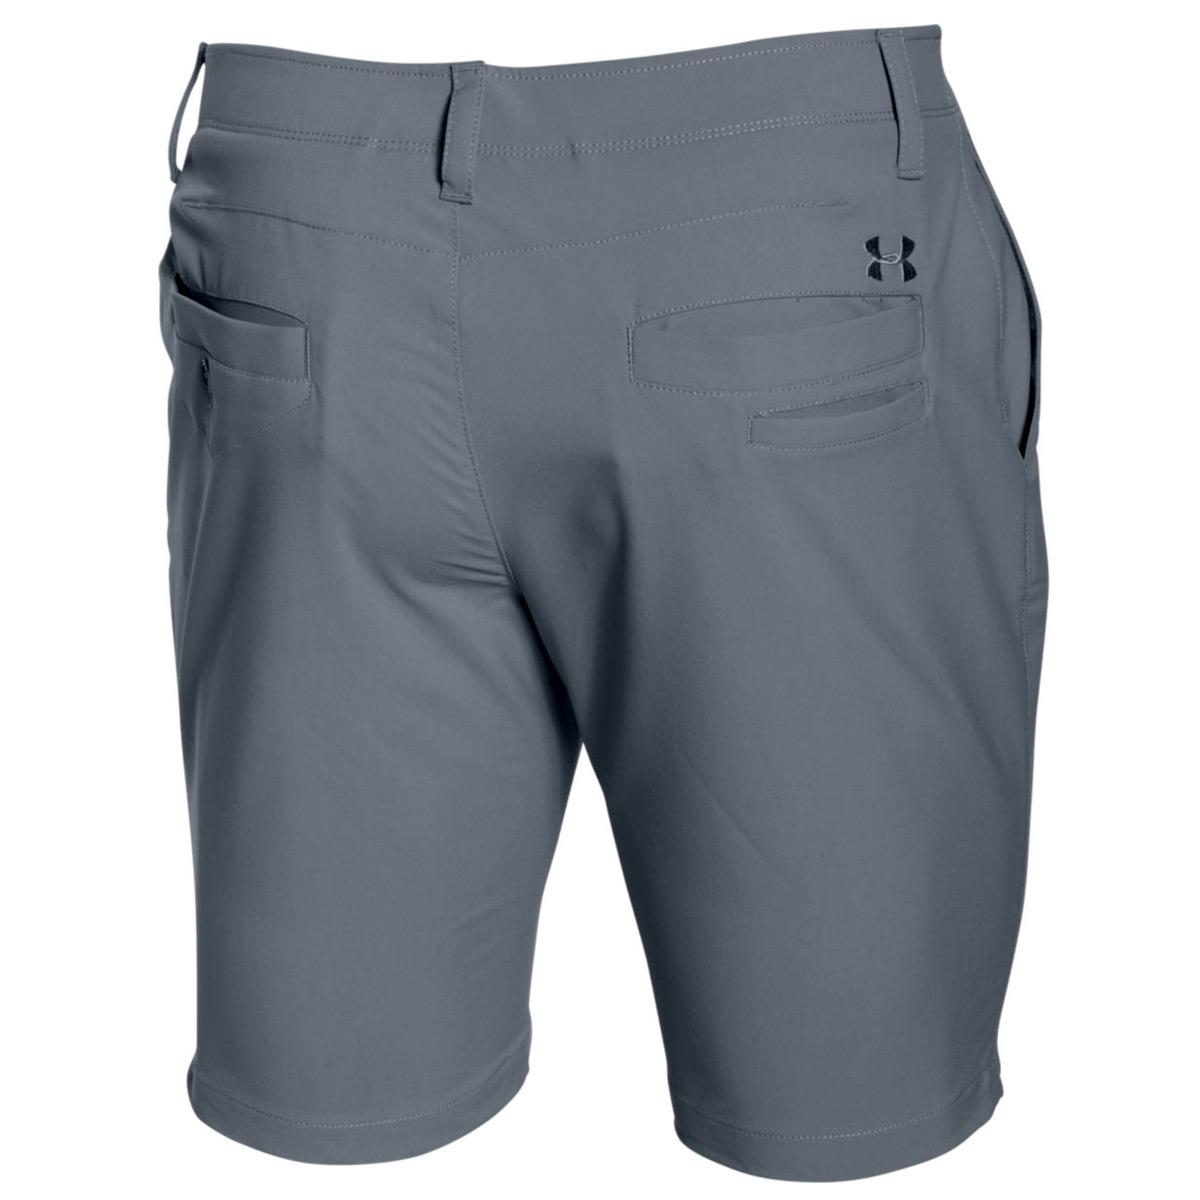 Under-Armour-Homme-UA-Match-Play-conique-Tech-Performance-Golf-Shorts-29-off-RRP miniature 27